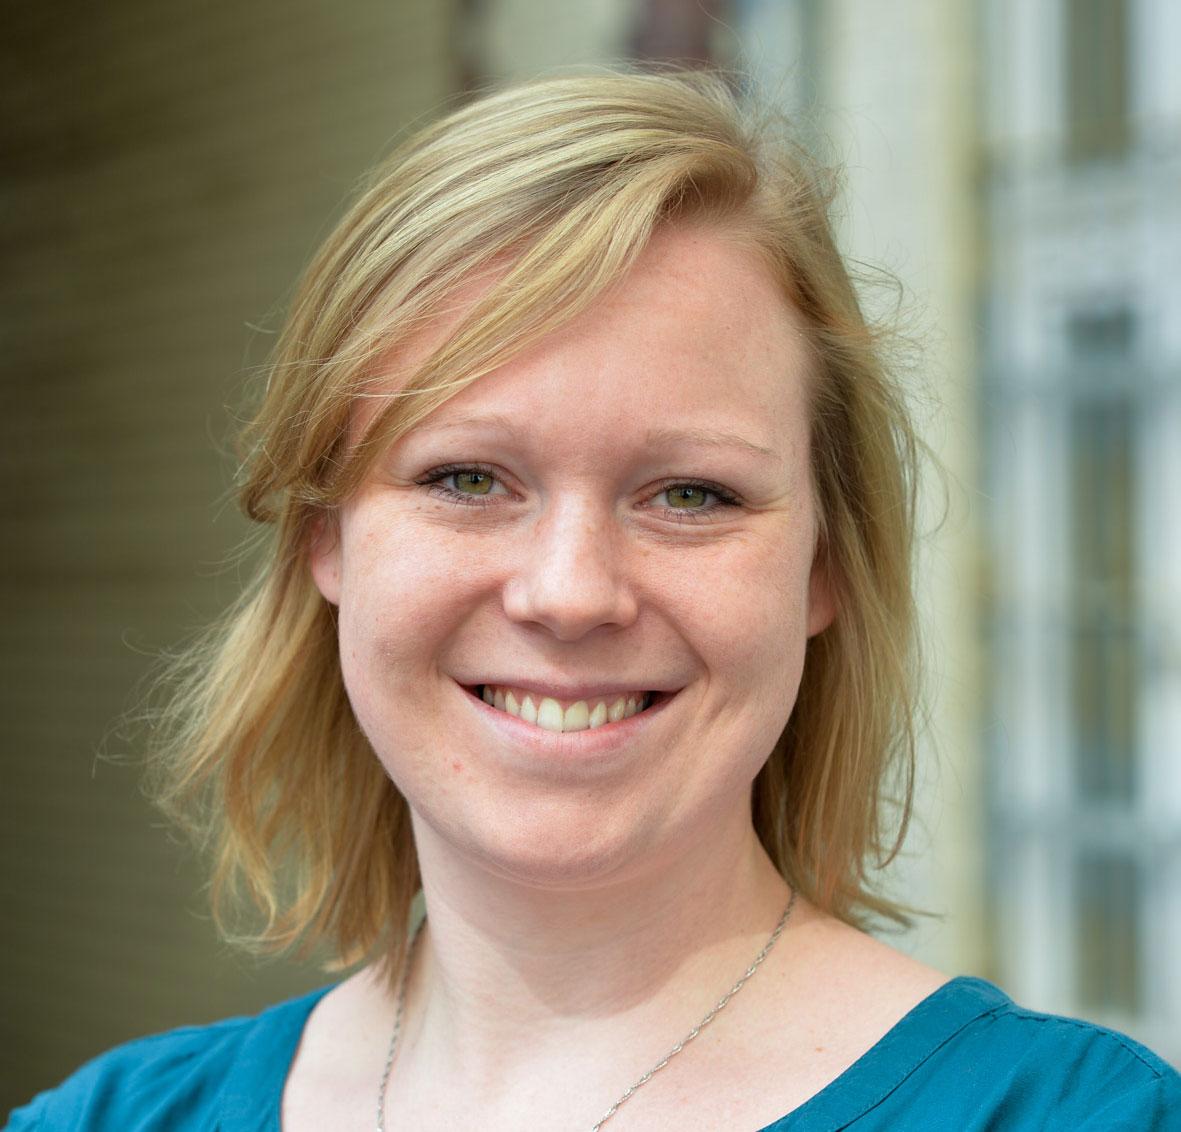 Nicole Sprindt